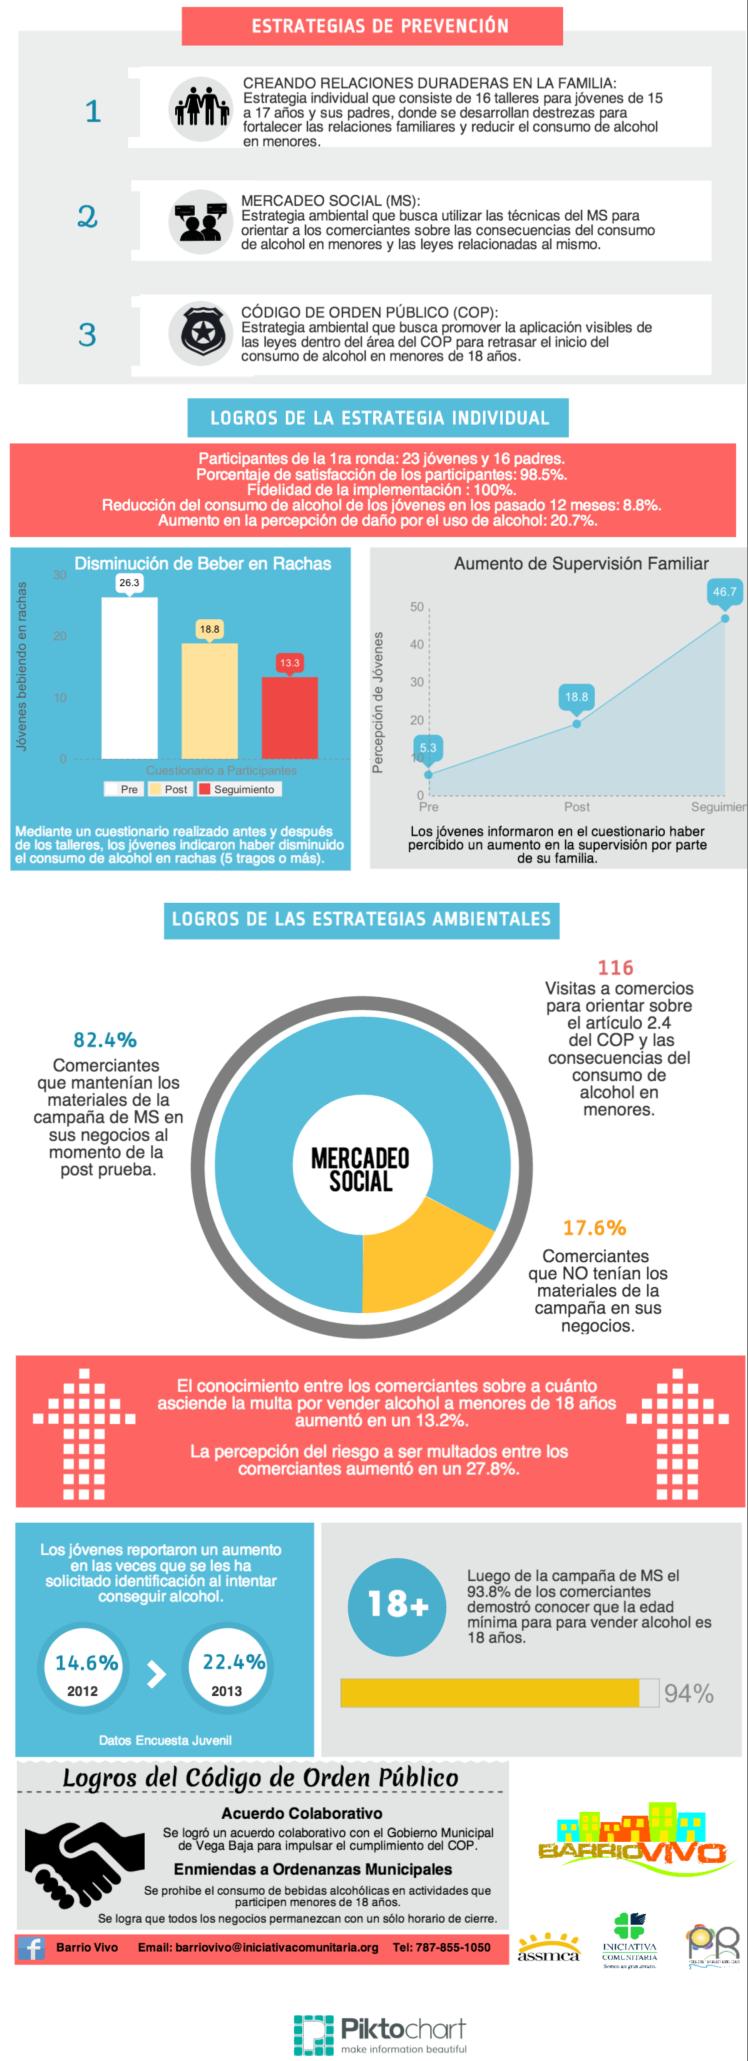 Infografica Barrio Vivo